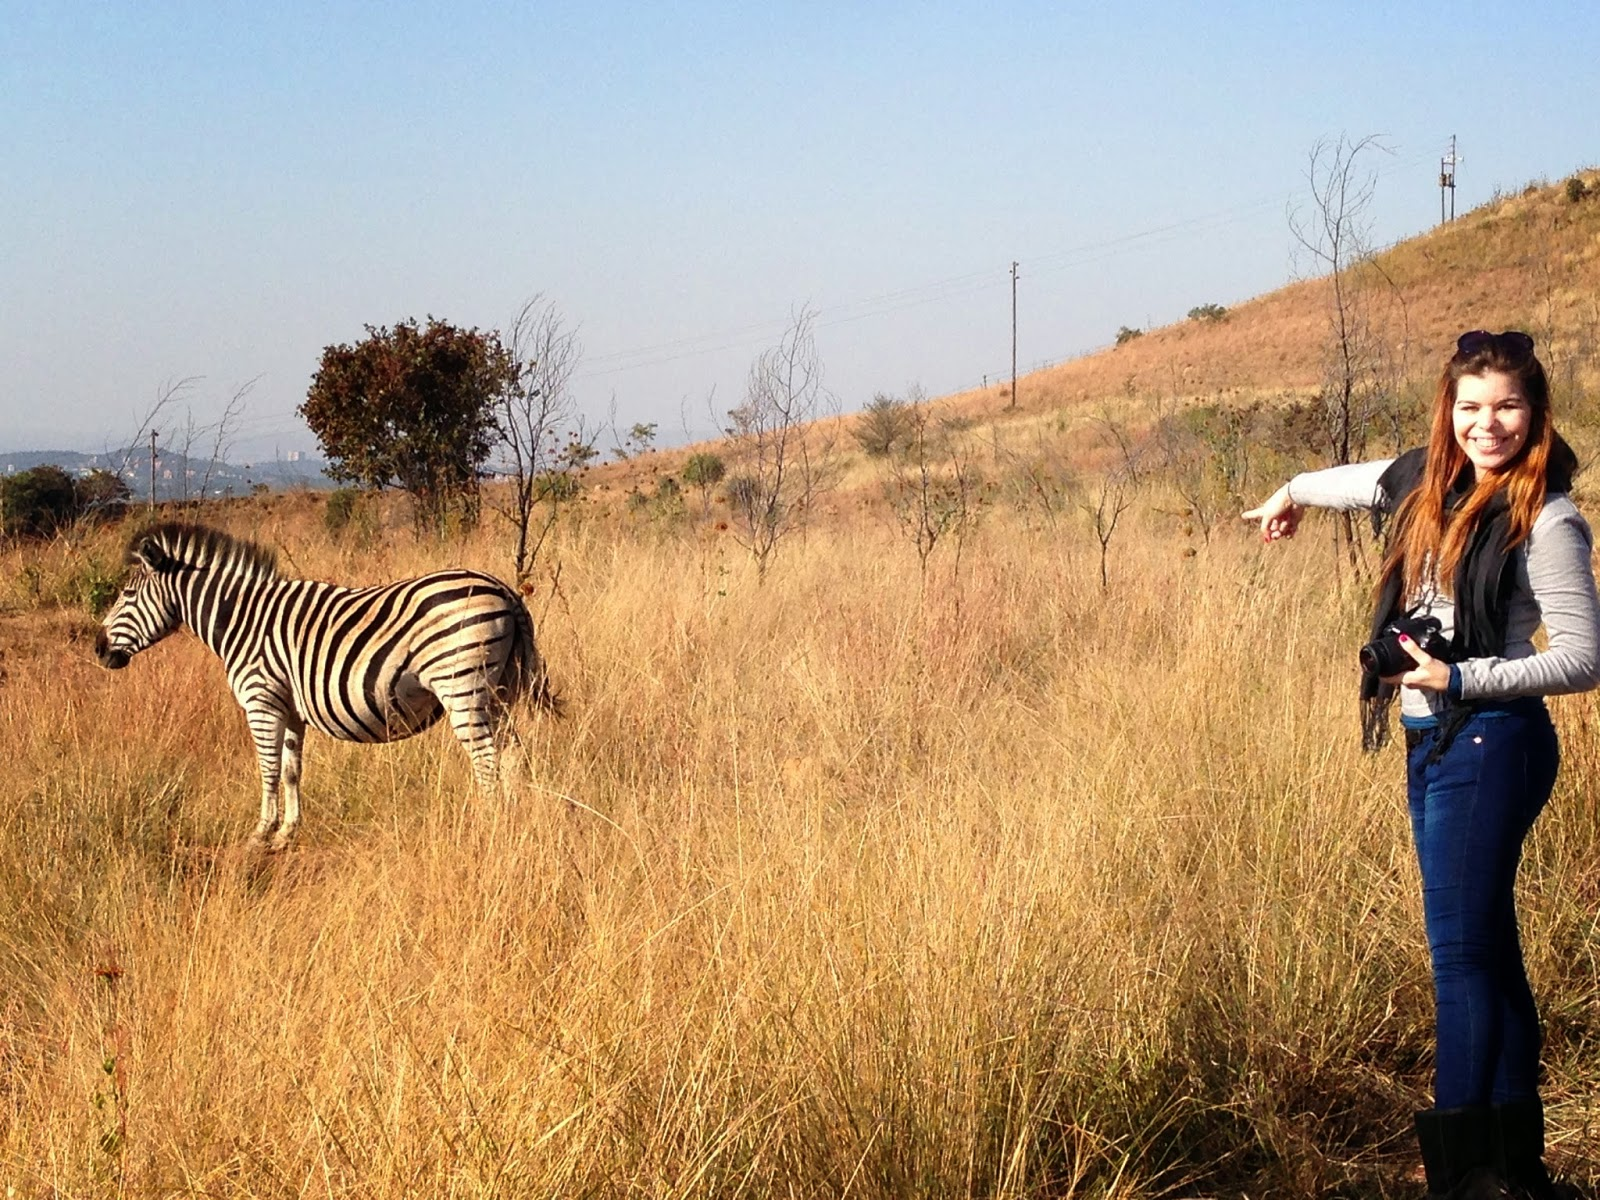 Groenkloof Nature Reserve, Pretoria